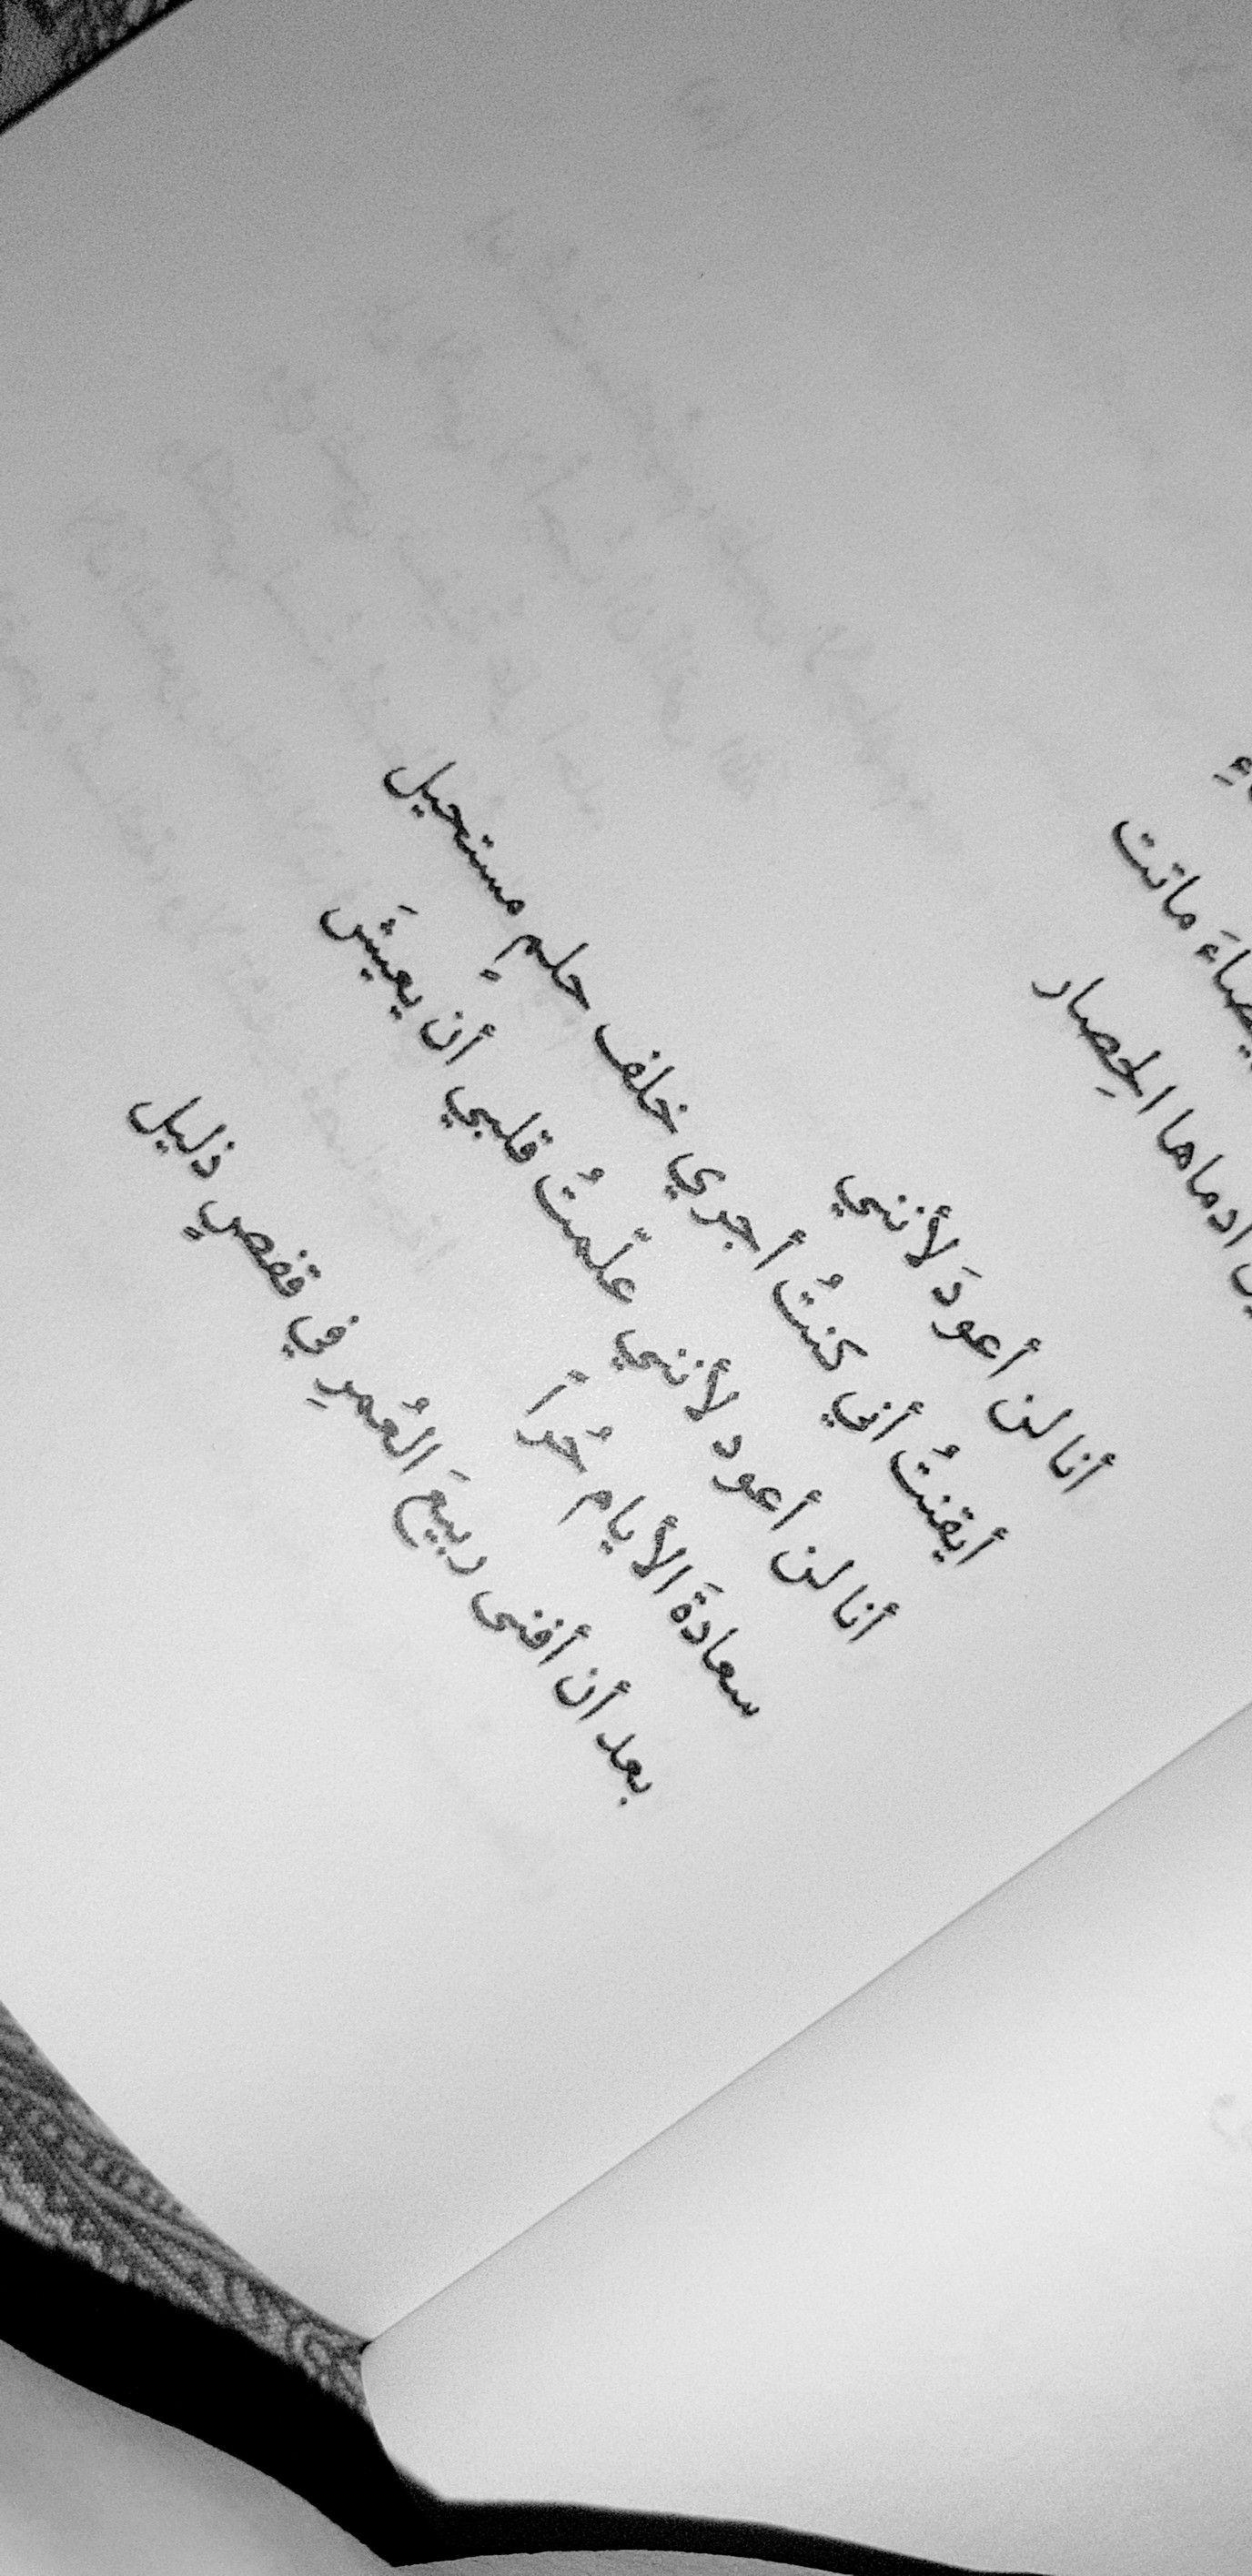 حلم مستحيل د ماجد عبدالله كتاب كل شيء يتغير Arabic Poetry Tattoo Quotes Arabic Quotes